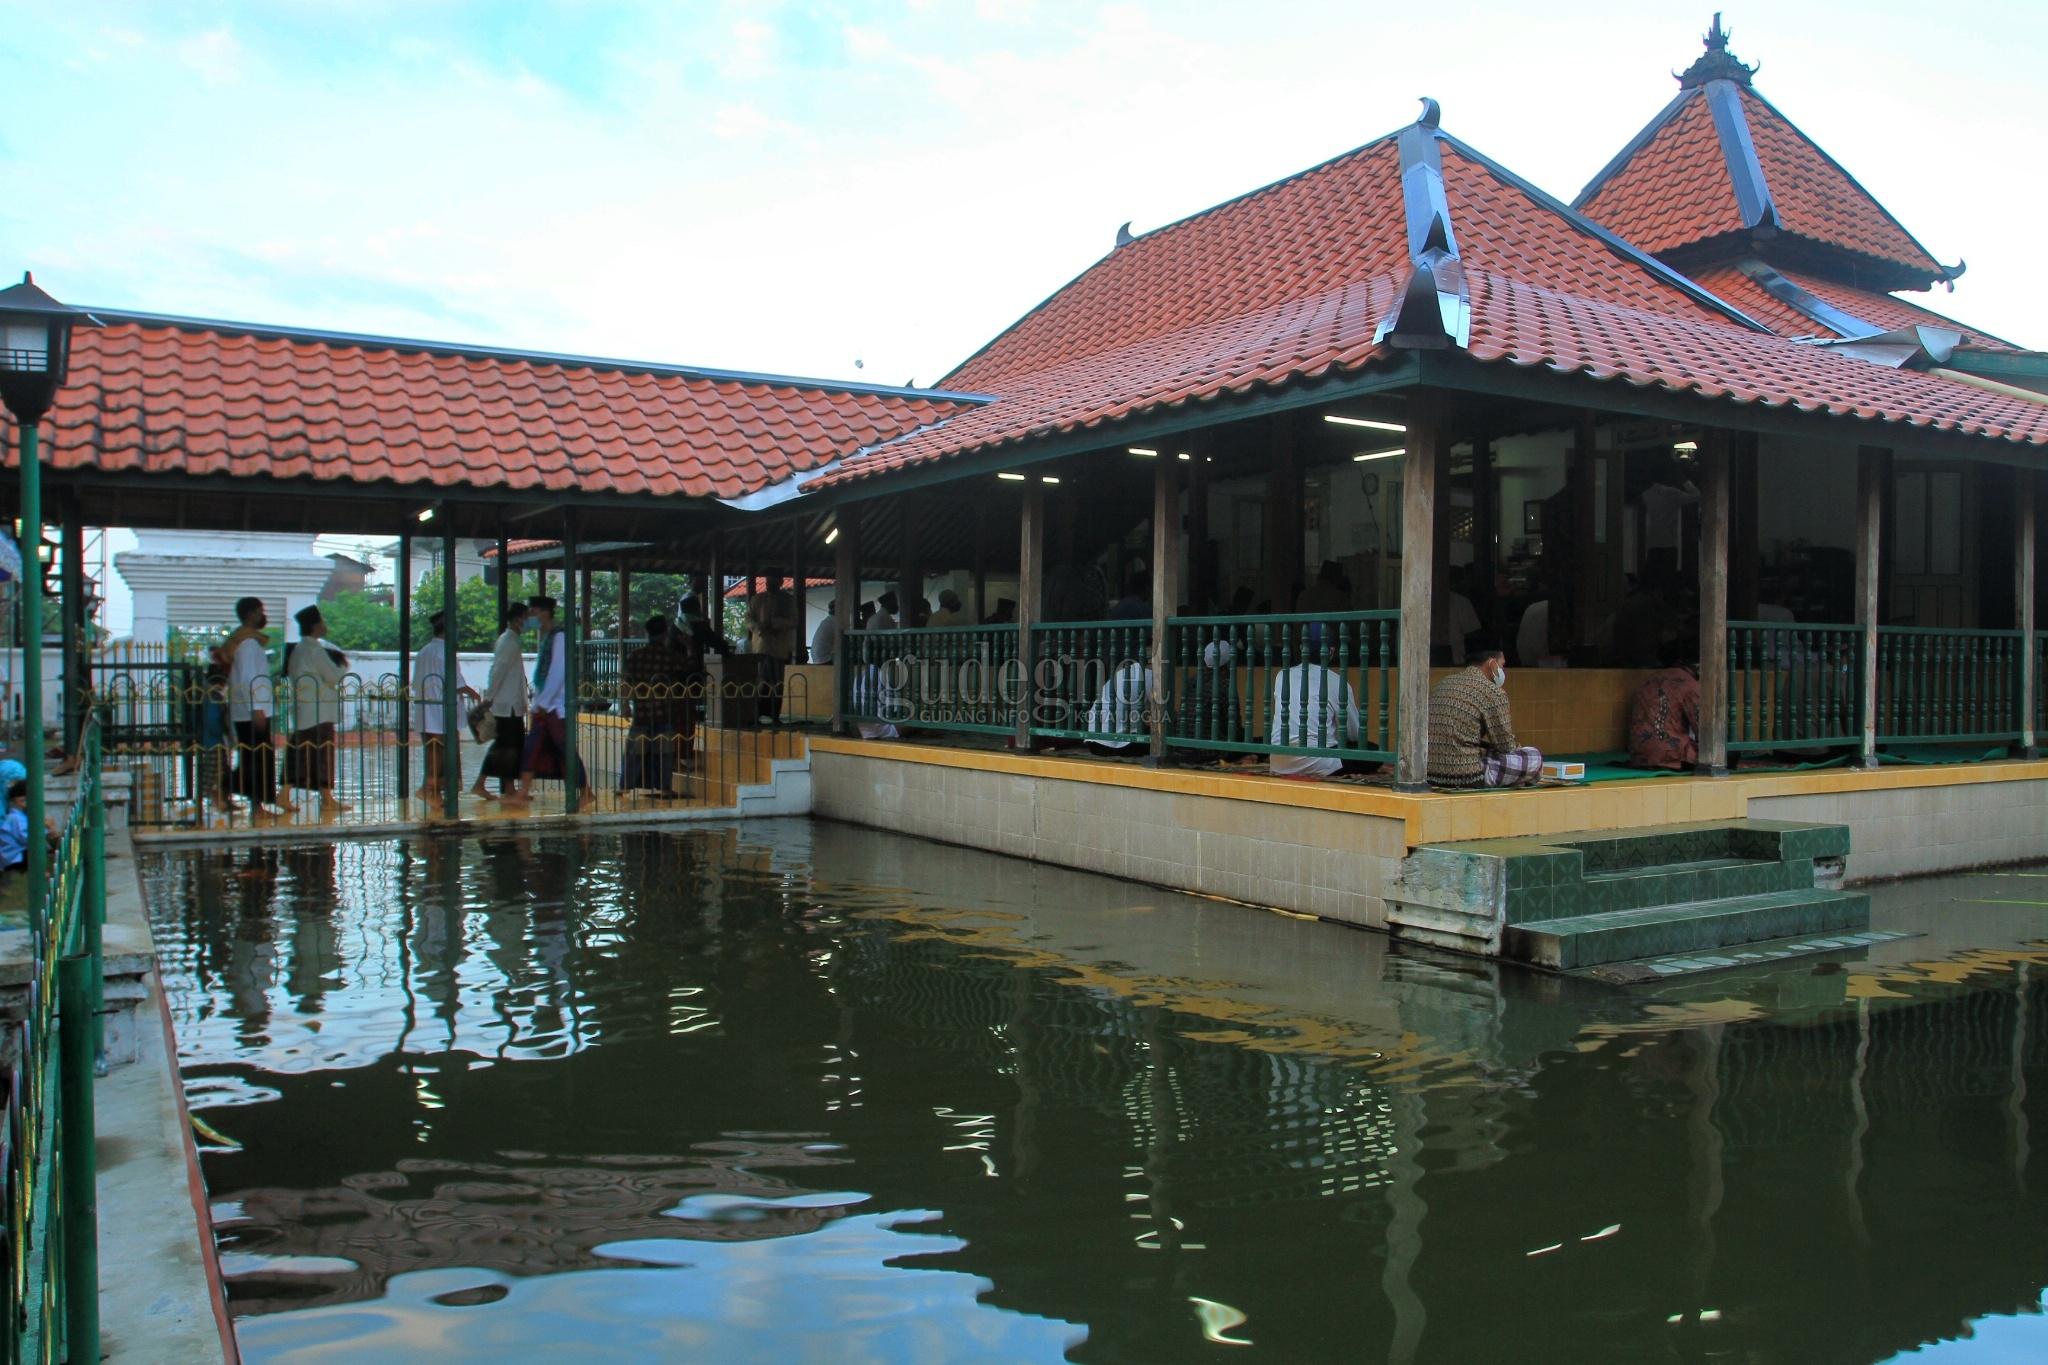 Masjid Pathok Negoro Gelar Salat Iduladha Dengan Prokes Ketat